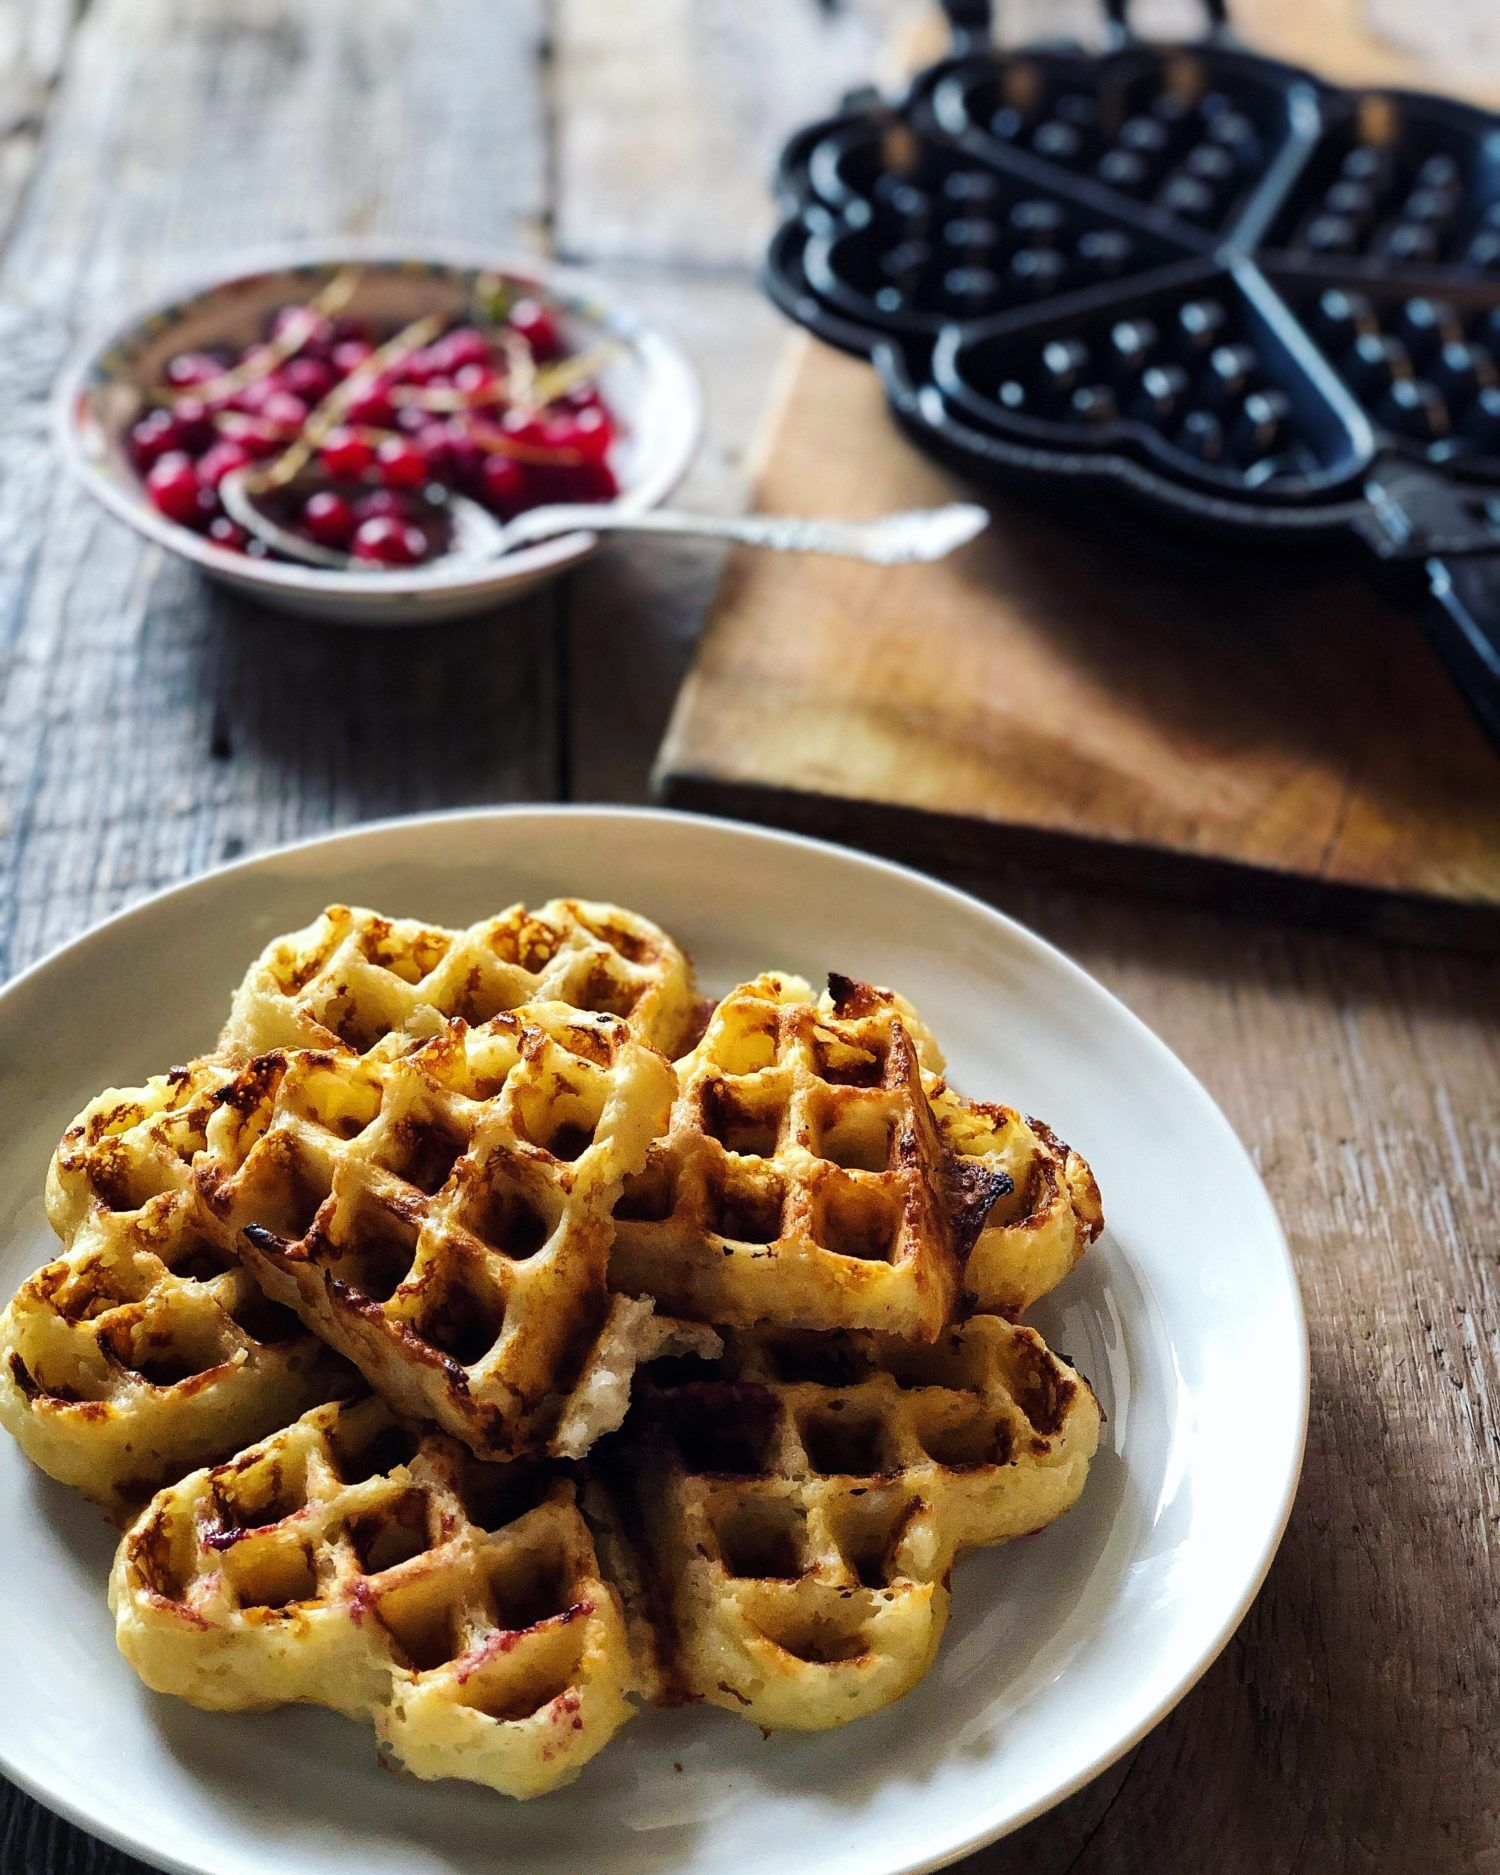 Scandinavian Crisp Waffles Whipped Cream Waffles Swedish Heart Shaped Waffles Crispy Waffle Waffles Waffle Maker Recipes